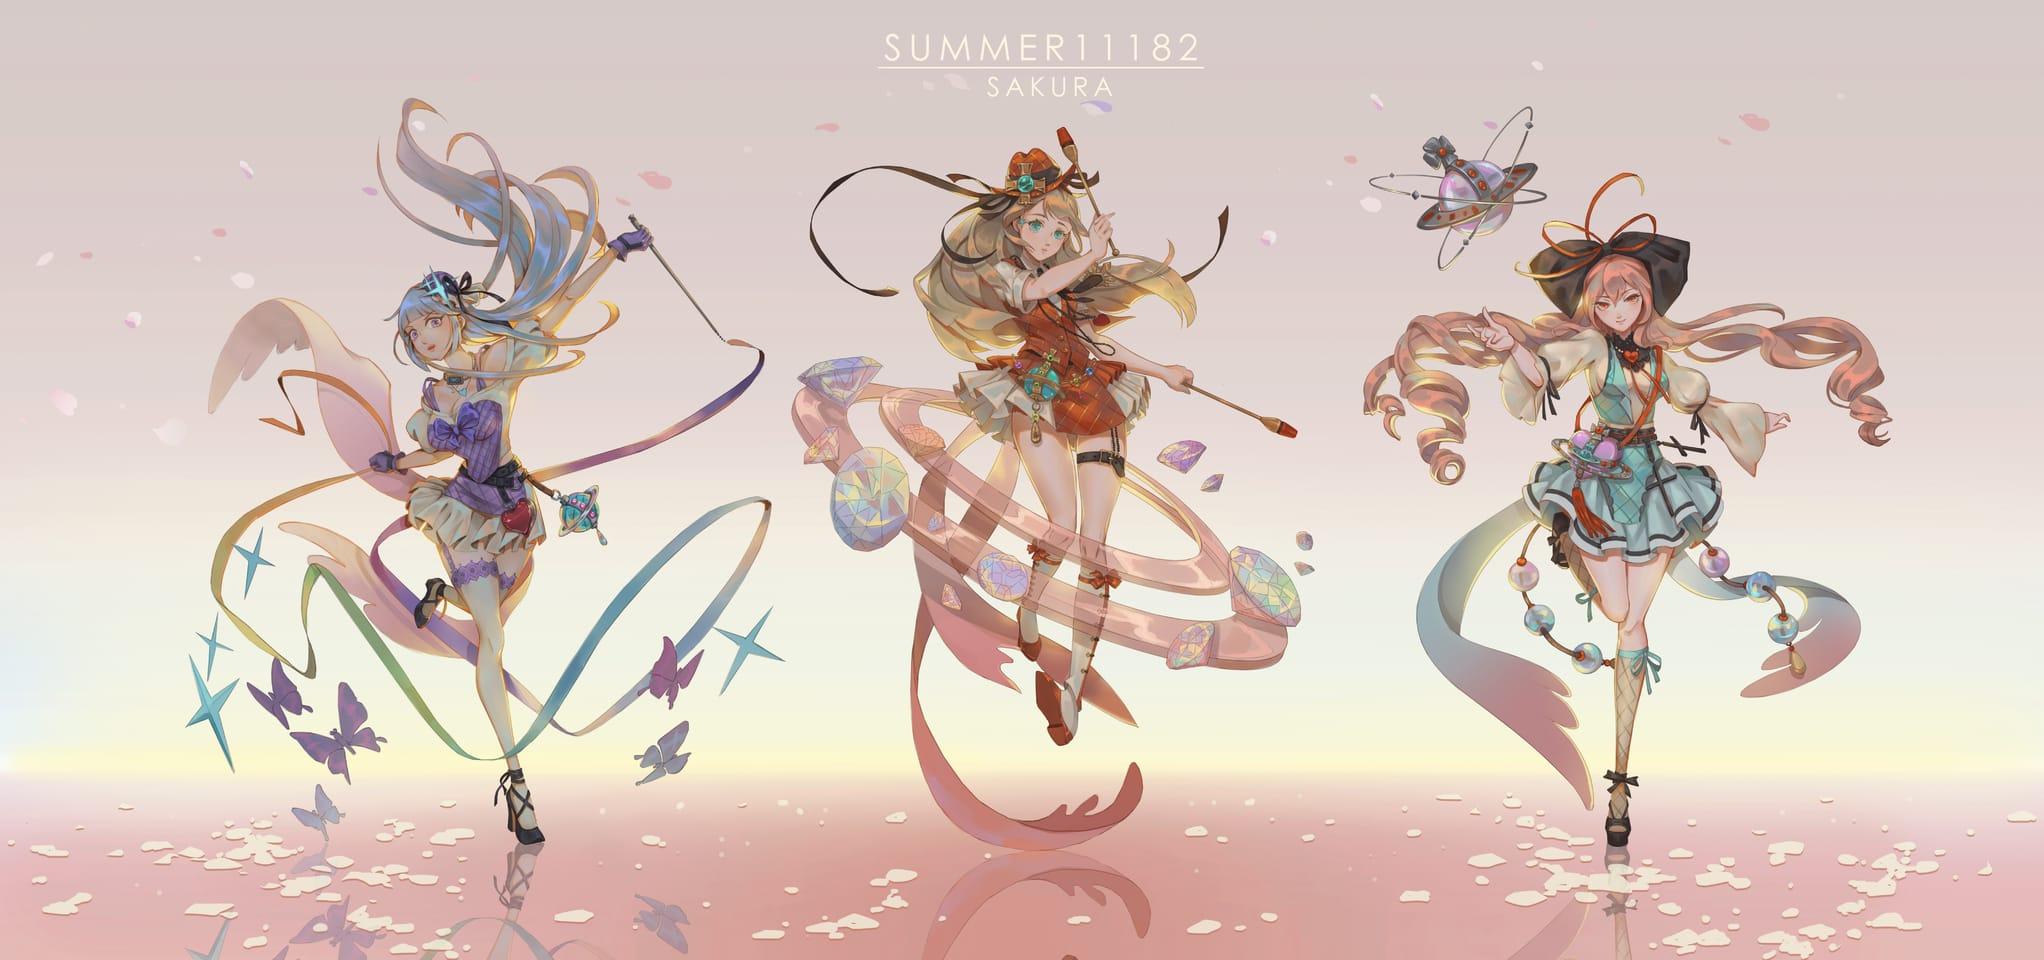 V&SAKURU Illust of summer11182 ふつくしい